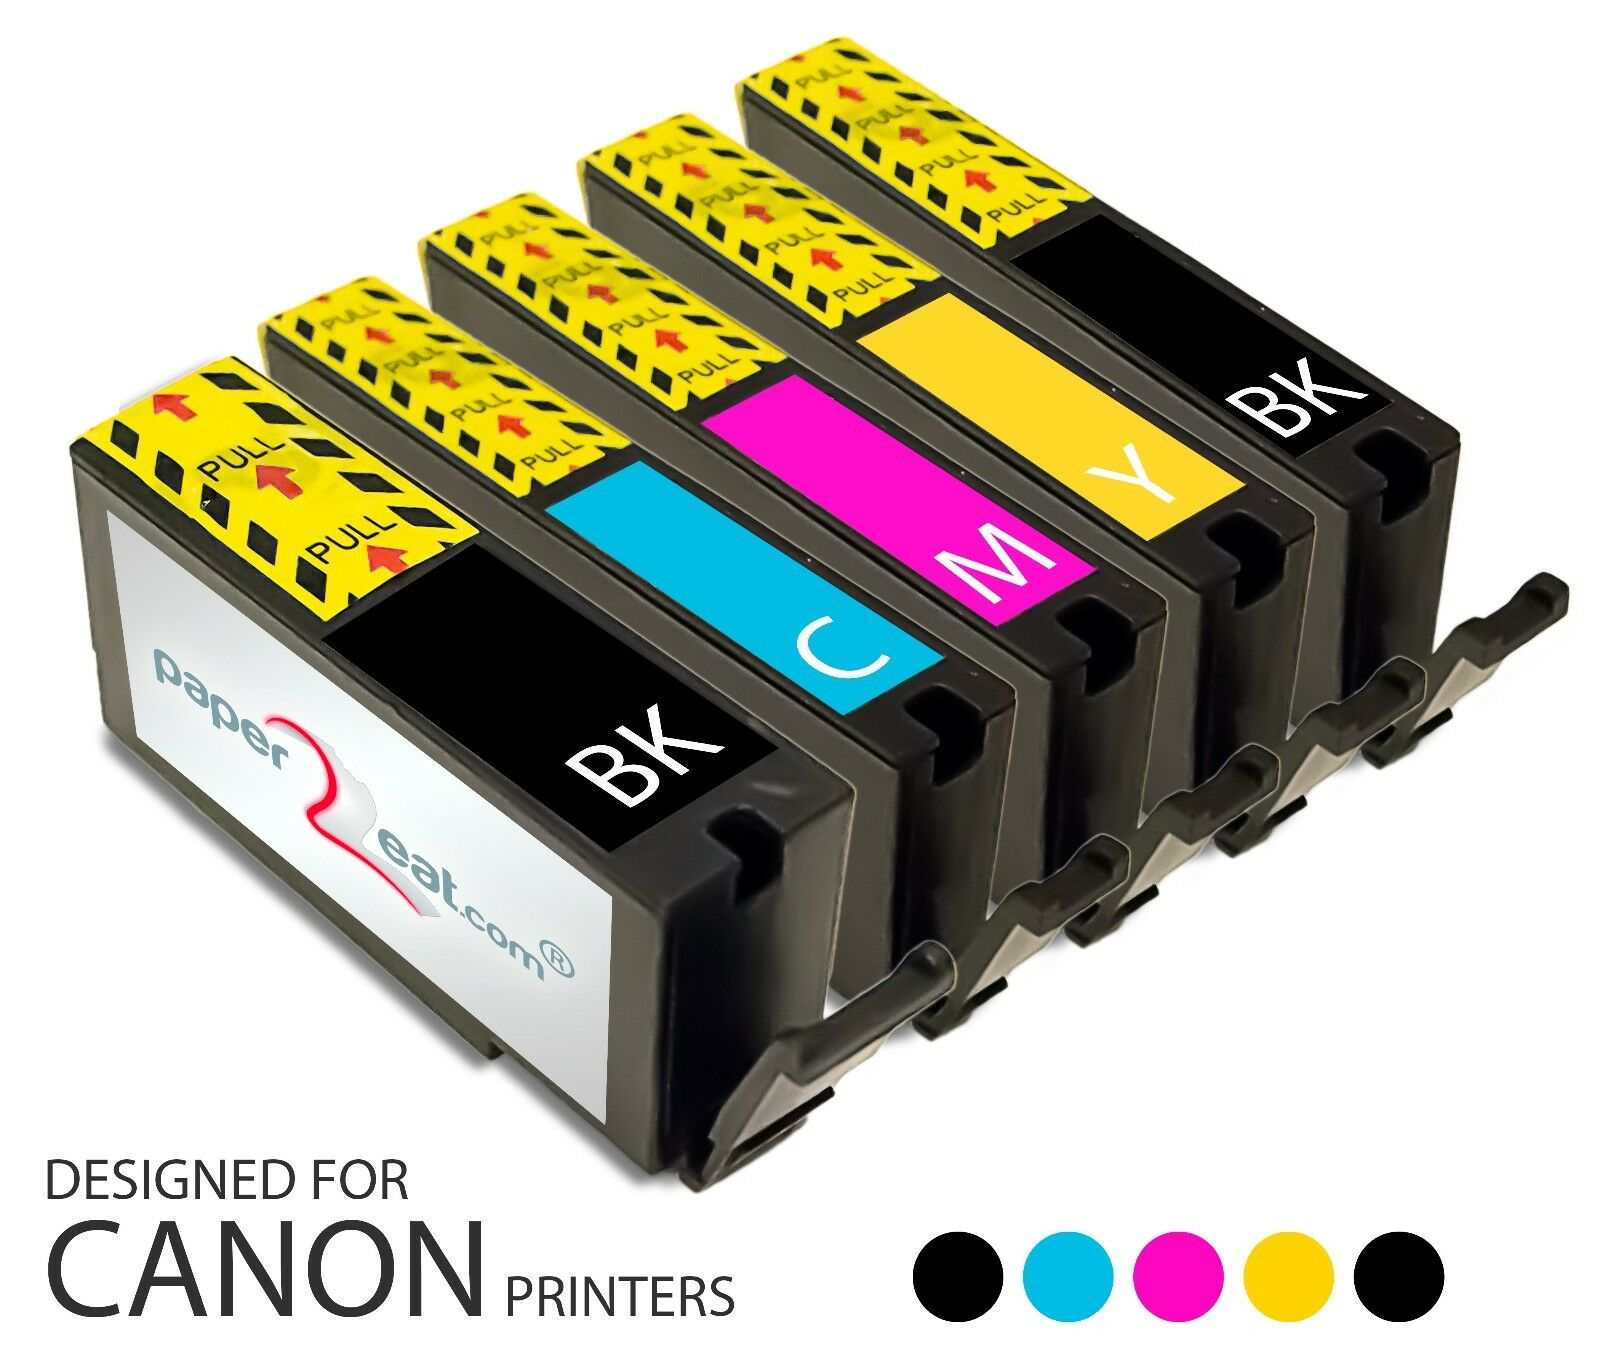 Set of 5 Refillable Edible Ink Cartridges Canon MG2420 PGI-250   CLI-251 Series